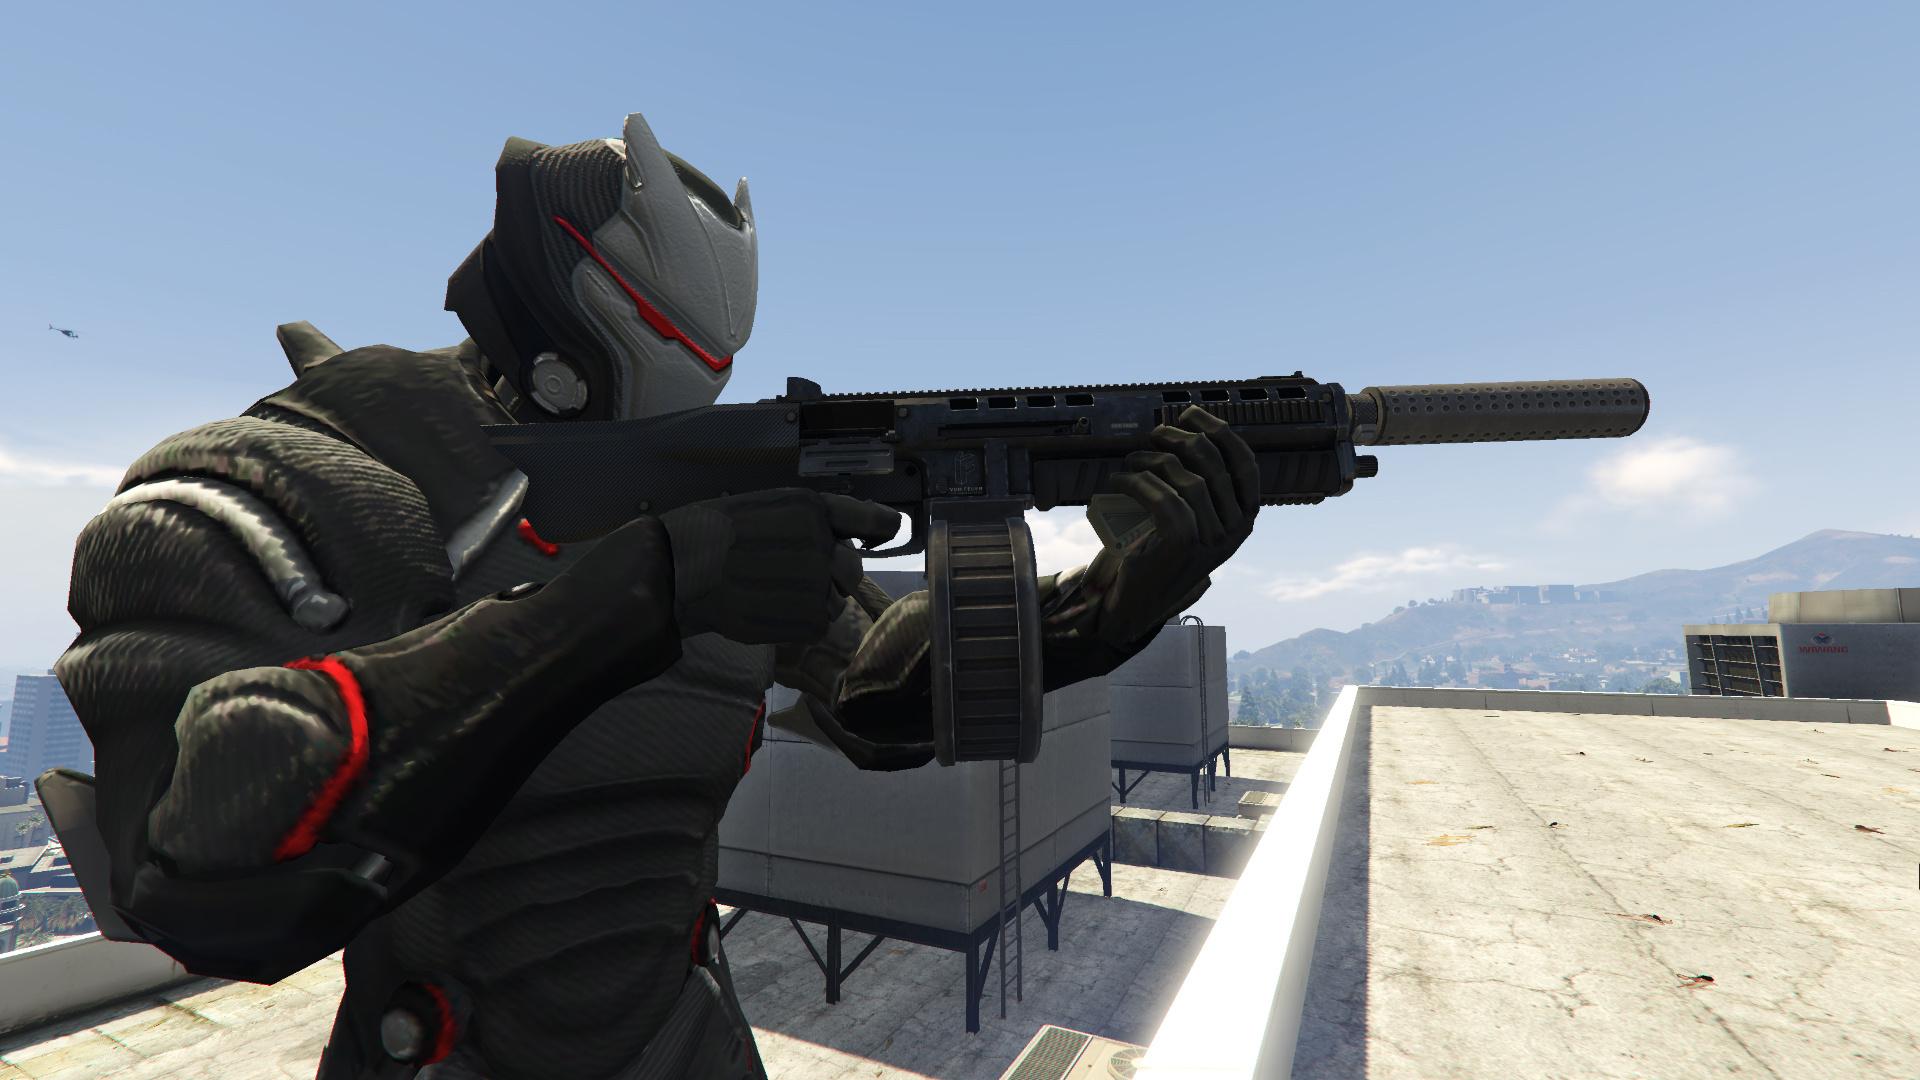 Fortnite Omega Gta5 Modscom